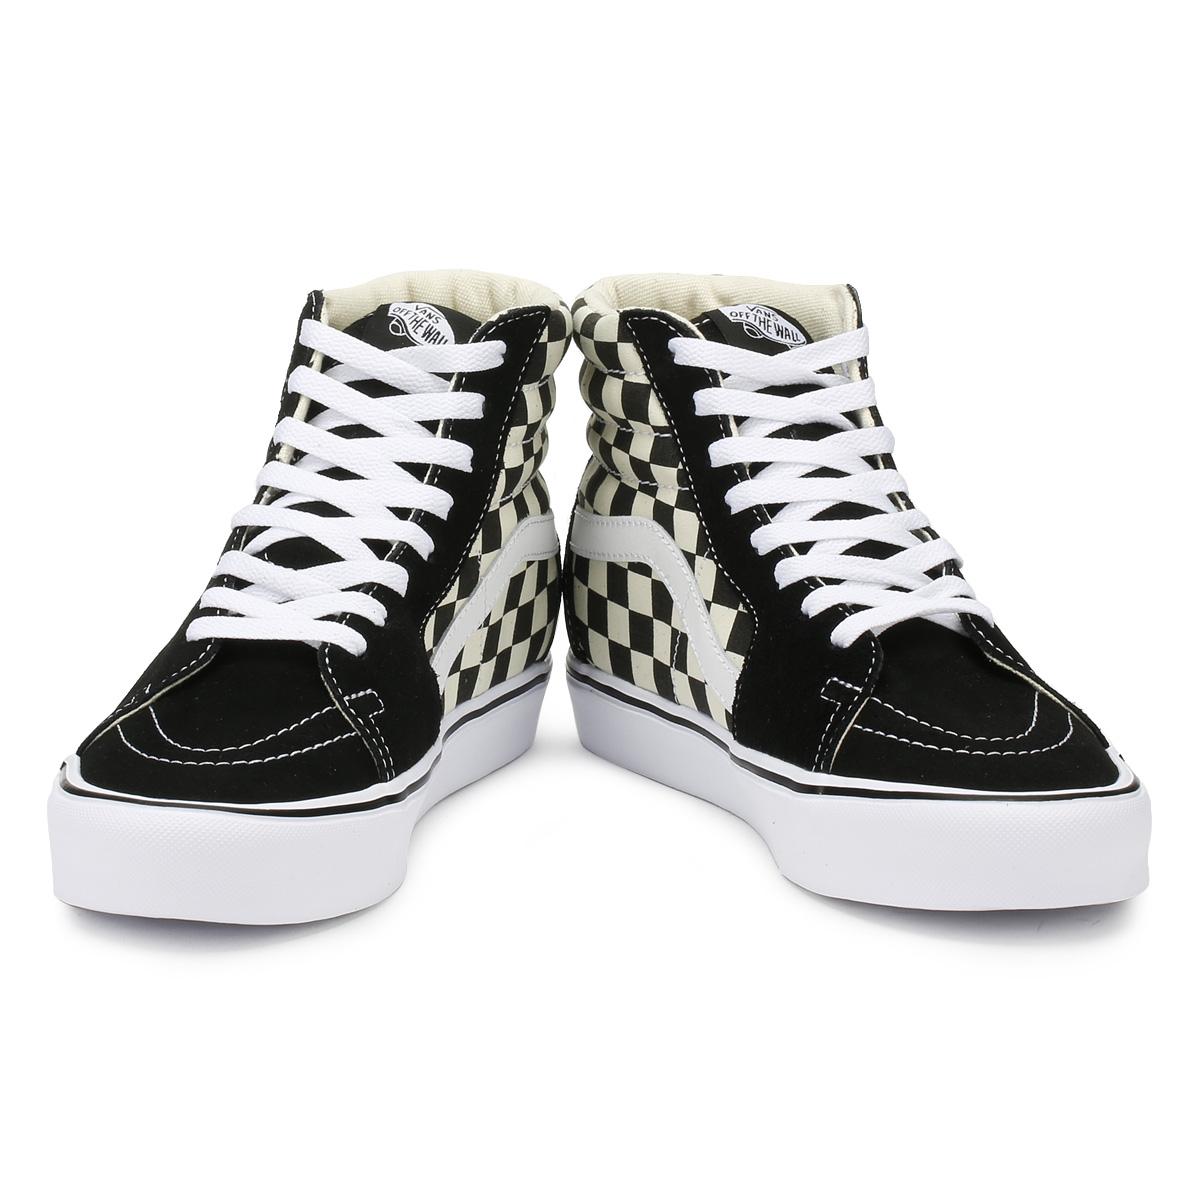 12f7d3b071af67 Vans Unisex Black   White Trainers Checkerboard SK8-Hi Lite Lace Up Skate  Shoes